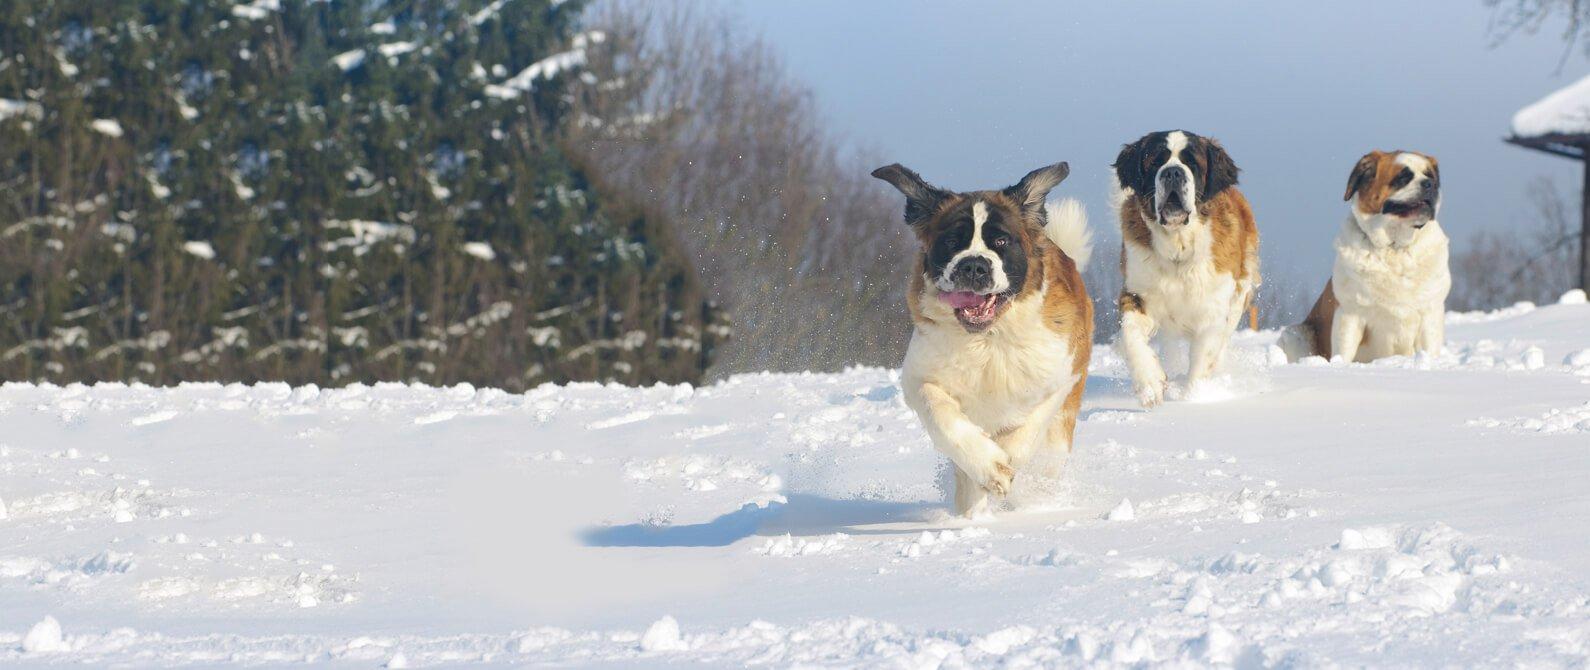 Barlow Trail Dogs - Barlow Trail Veterinary Clinic